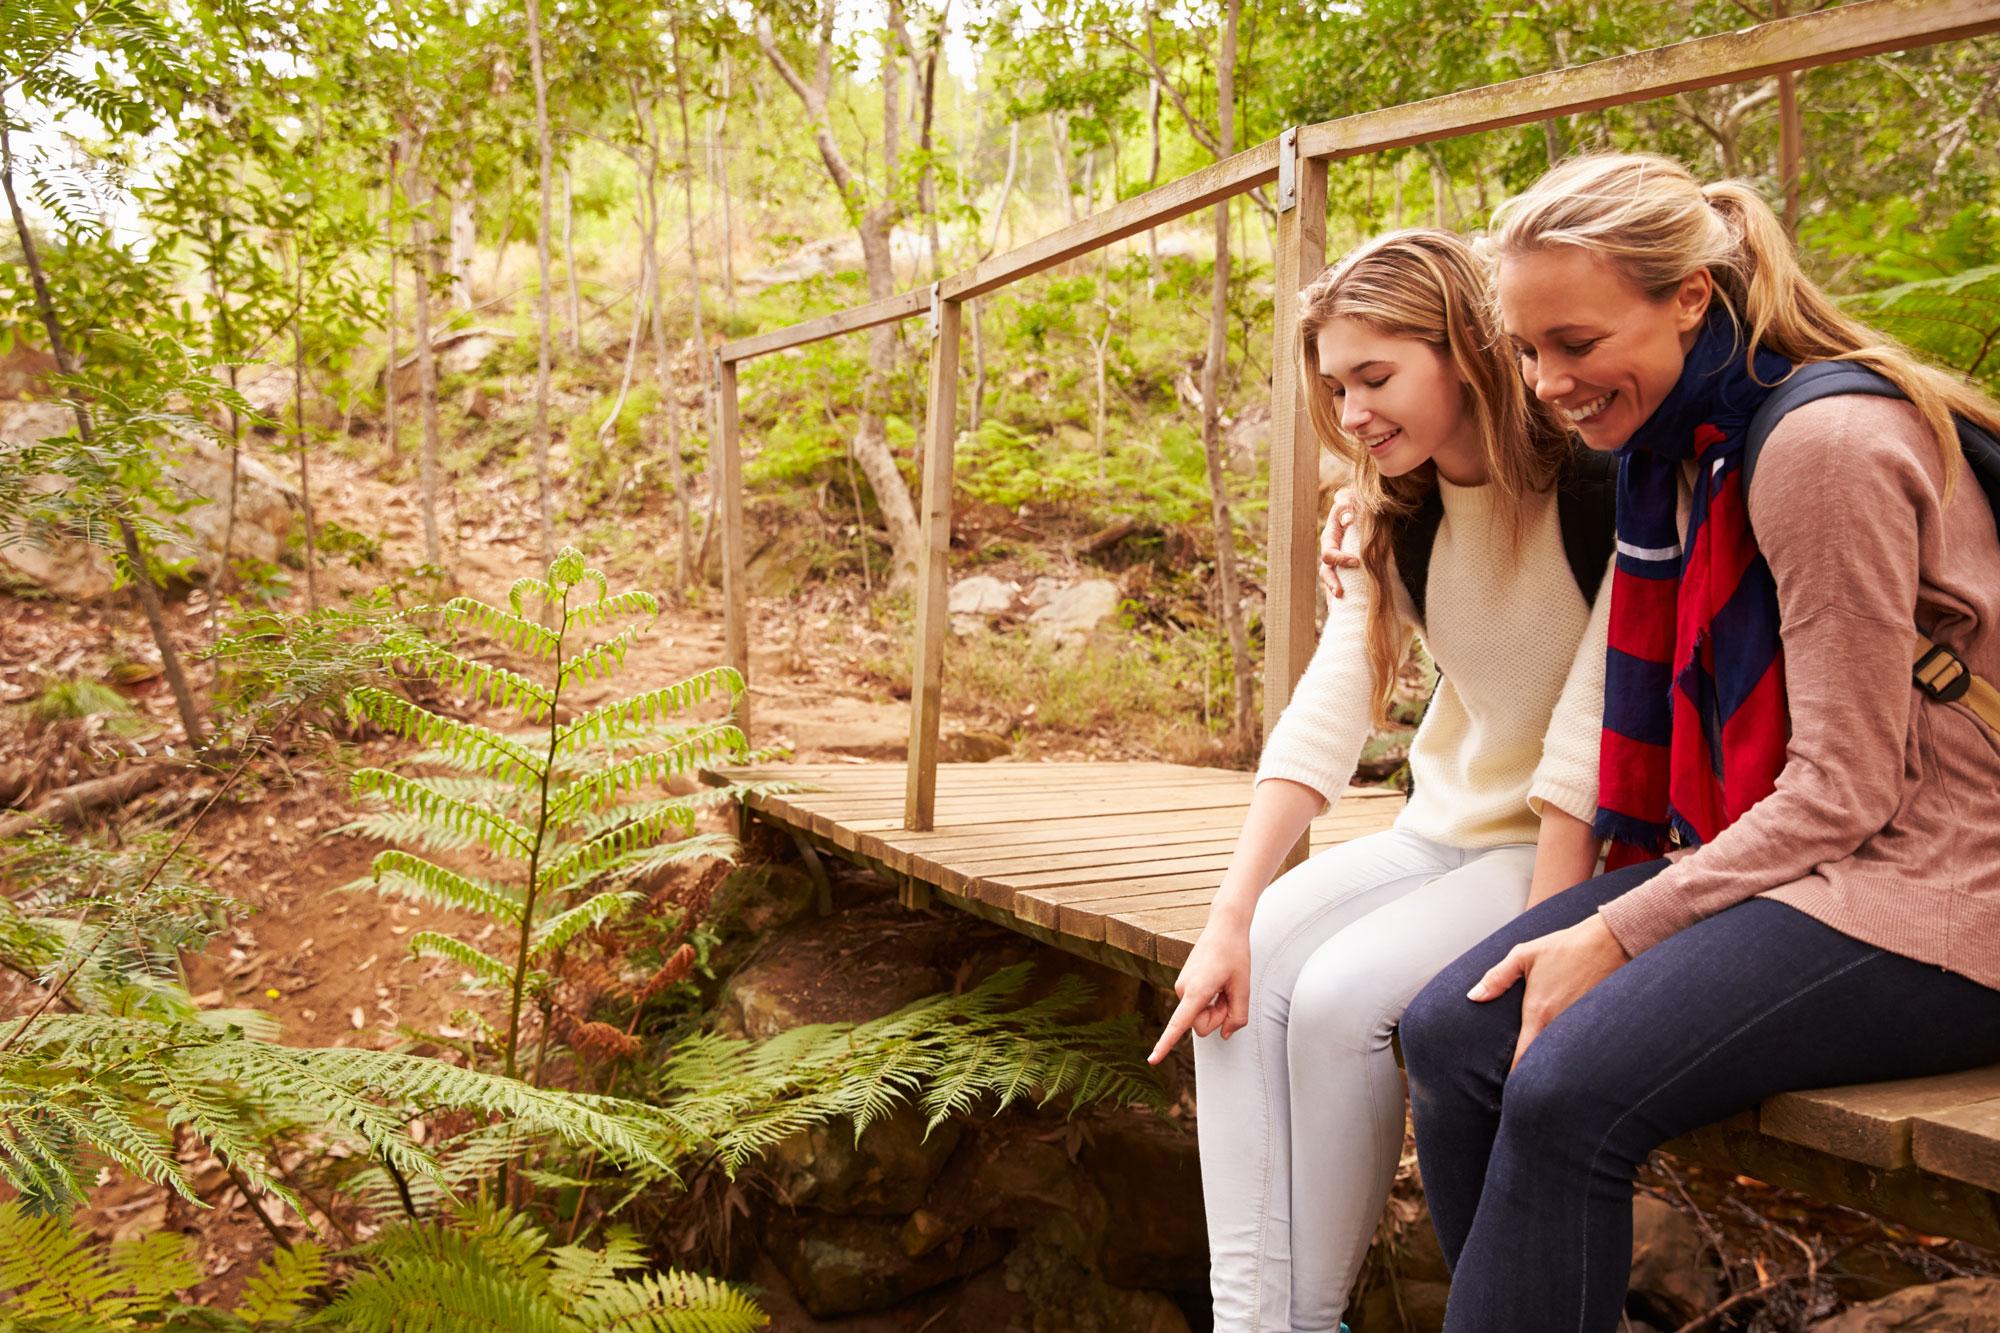 Mum and daughter talking sitting on a bridge.